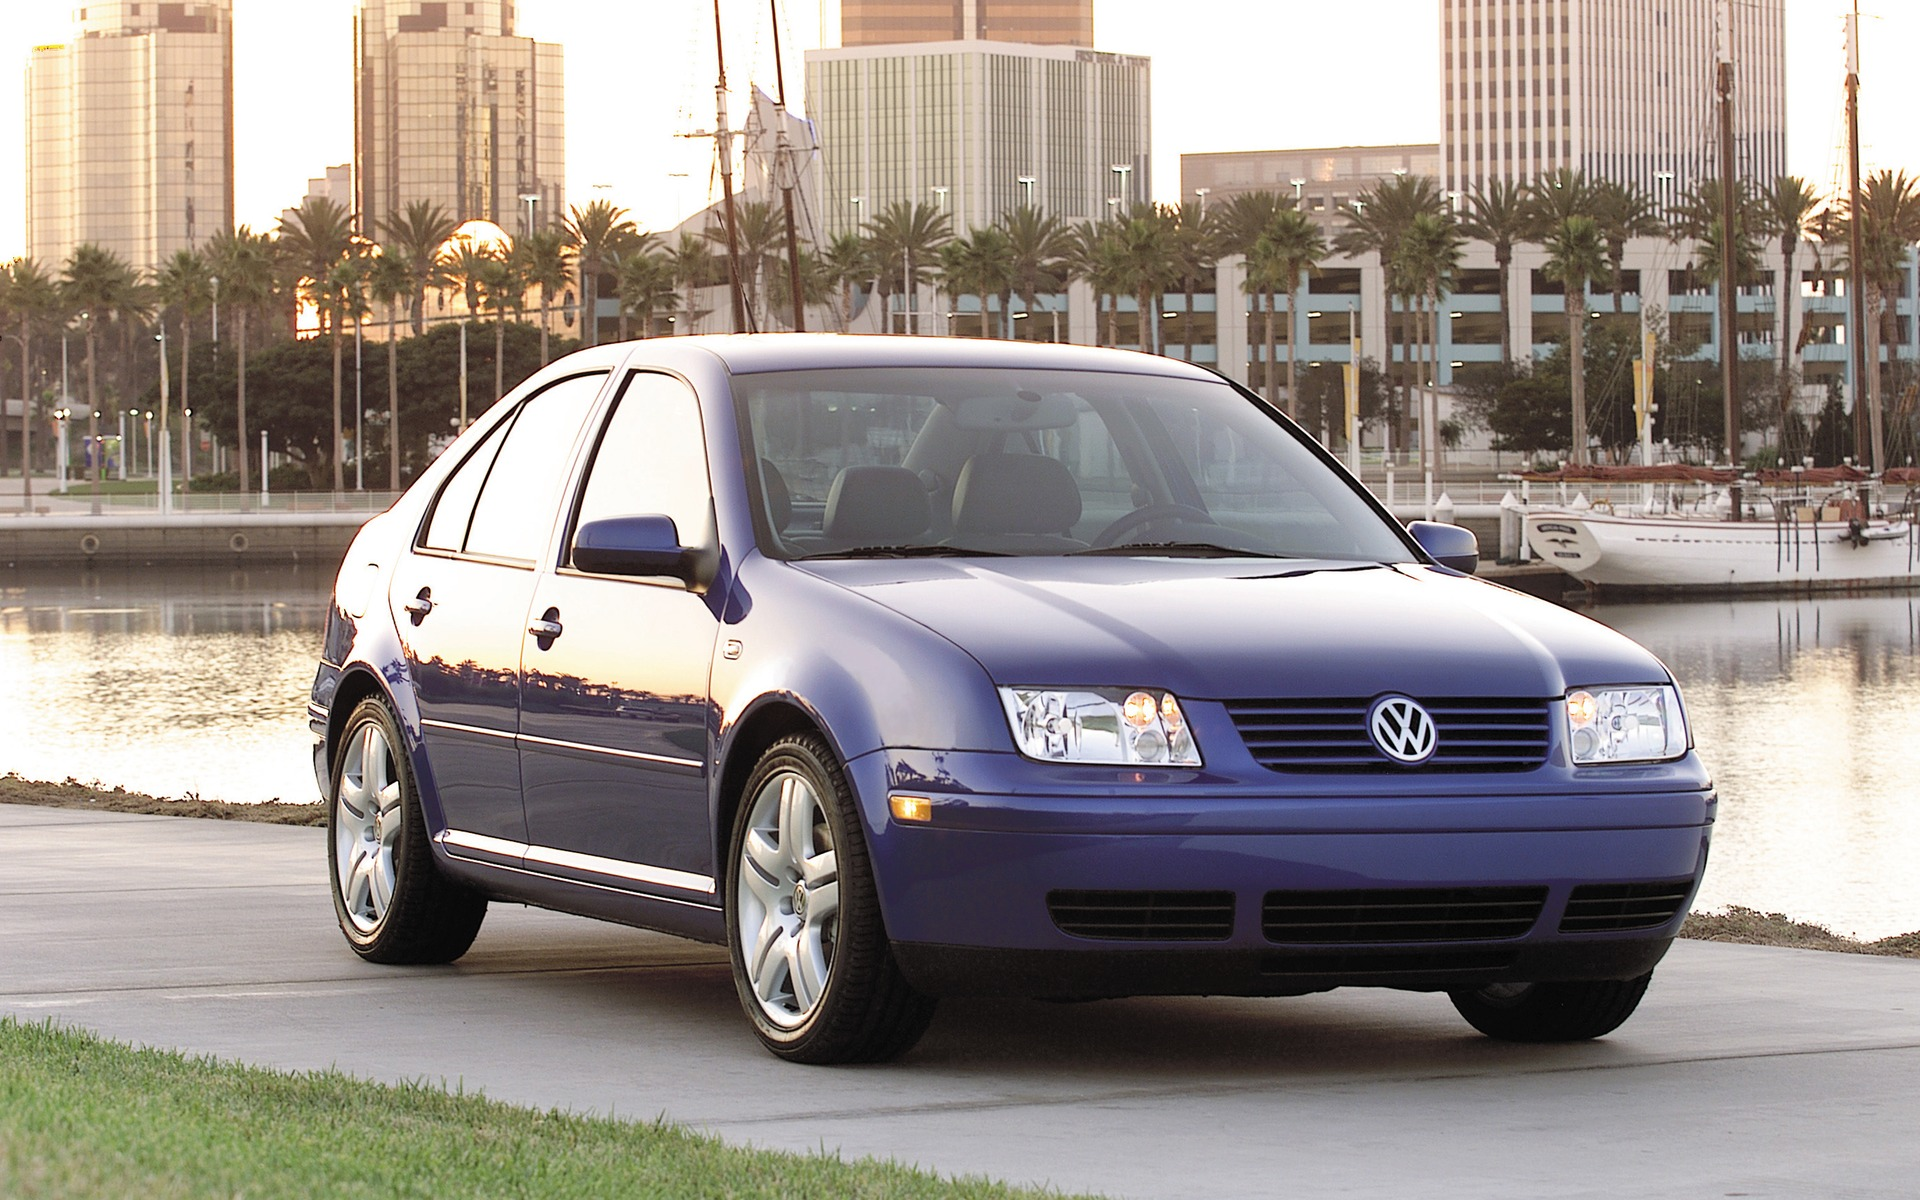 <p>Volkswagen Jetta<br>Generation #4 (1999-2005)</p>